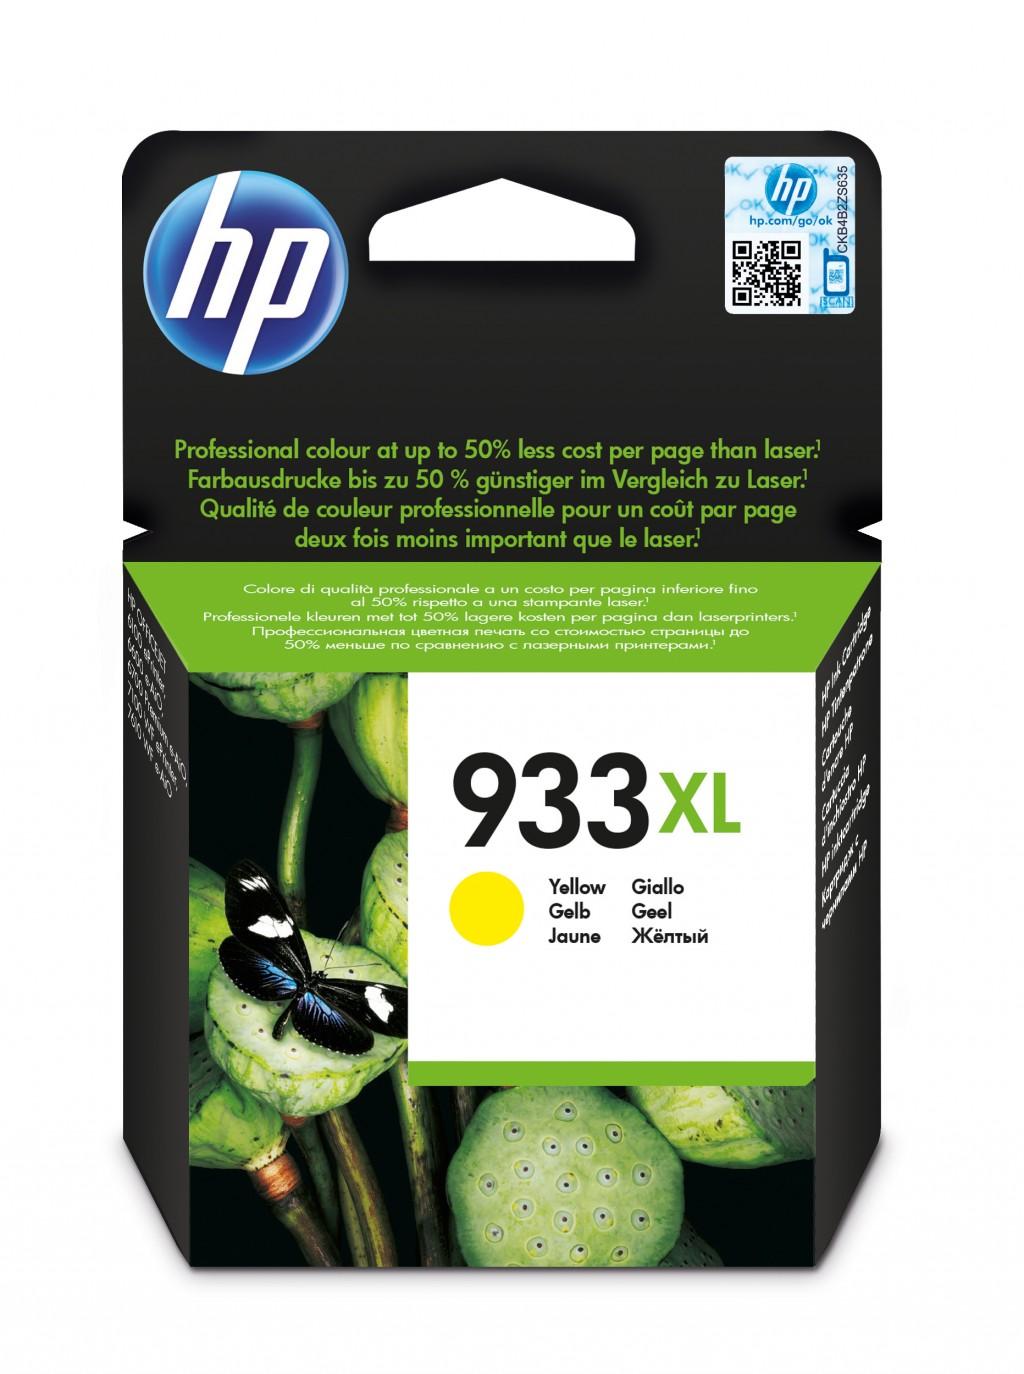 HP 933XL ink cartridge, yellow